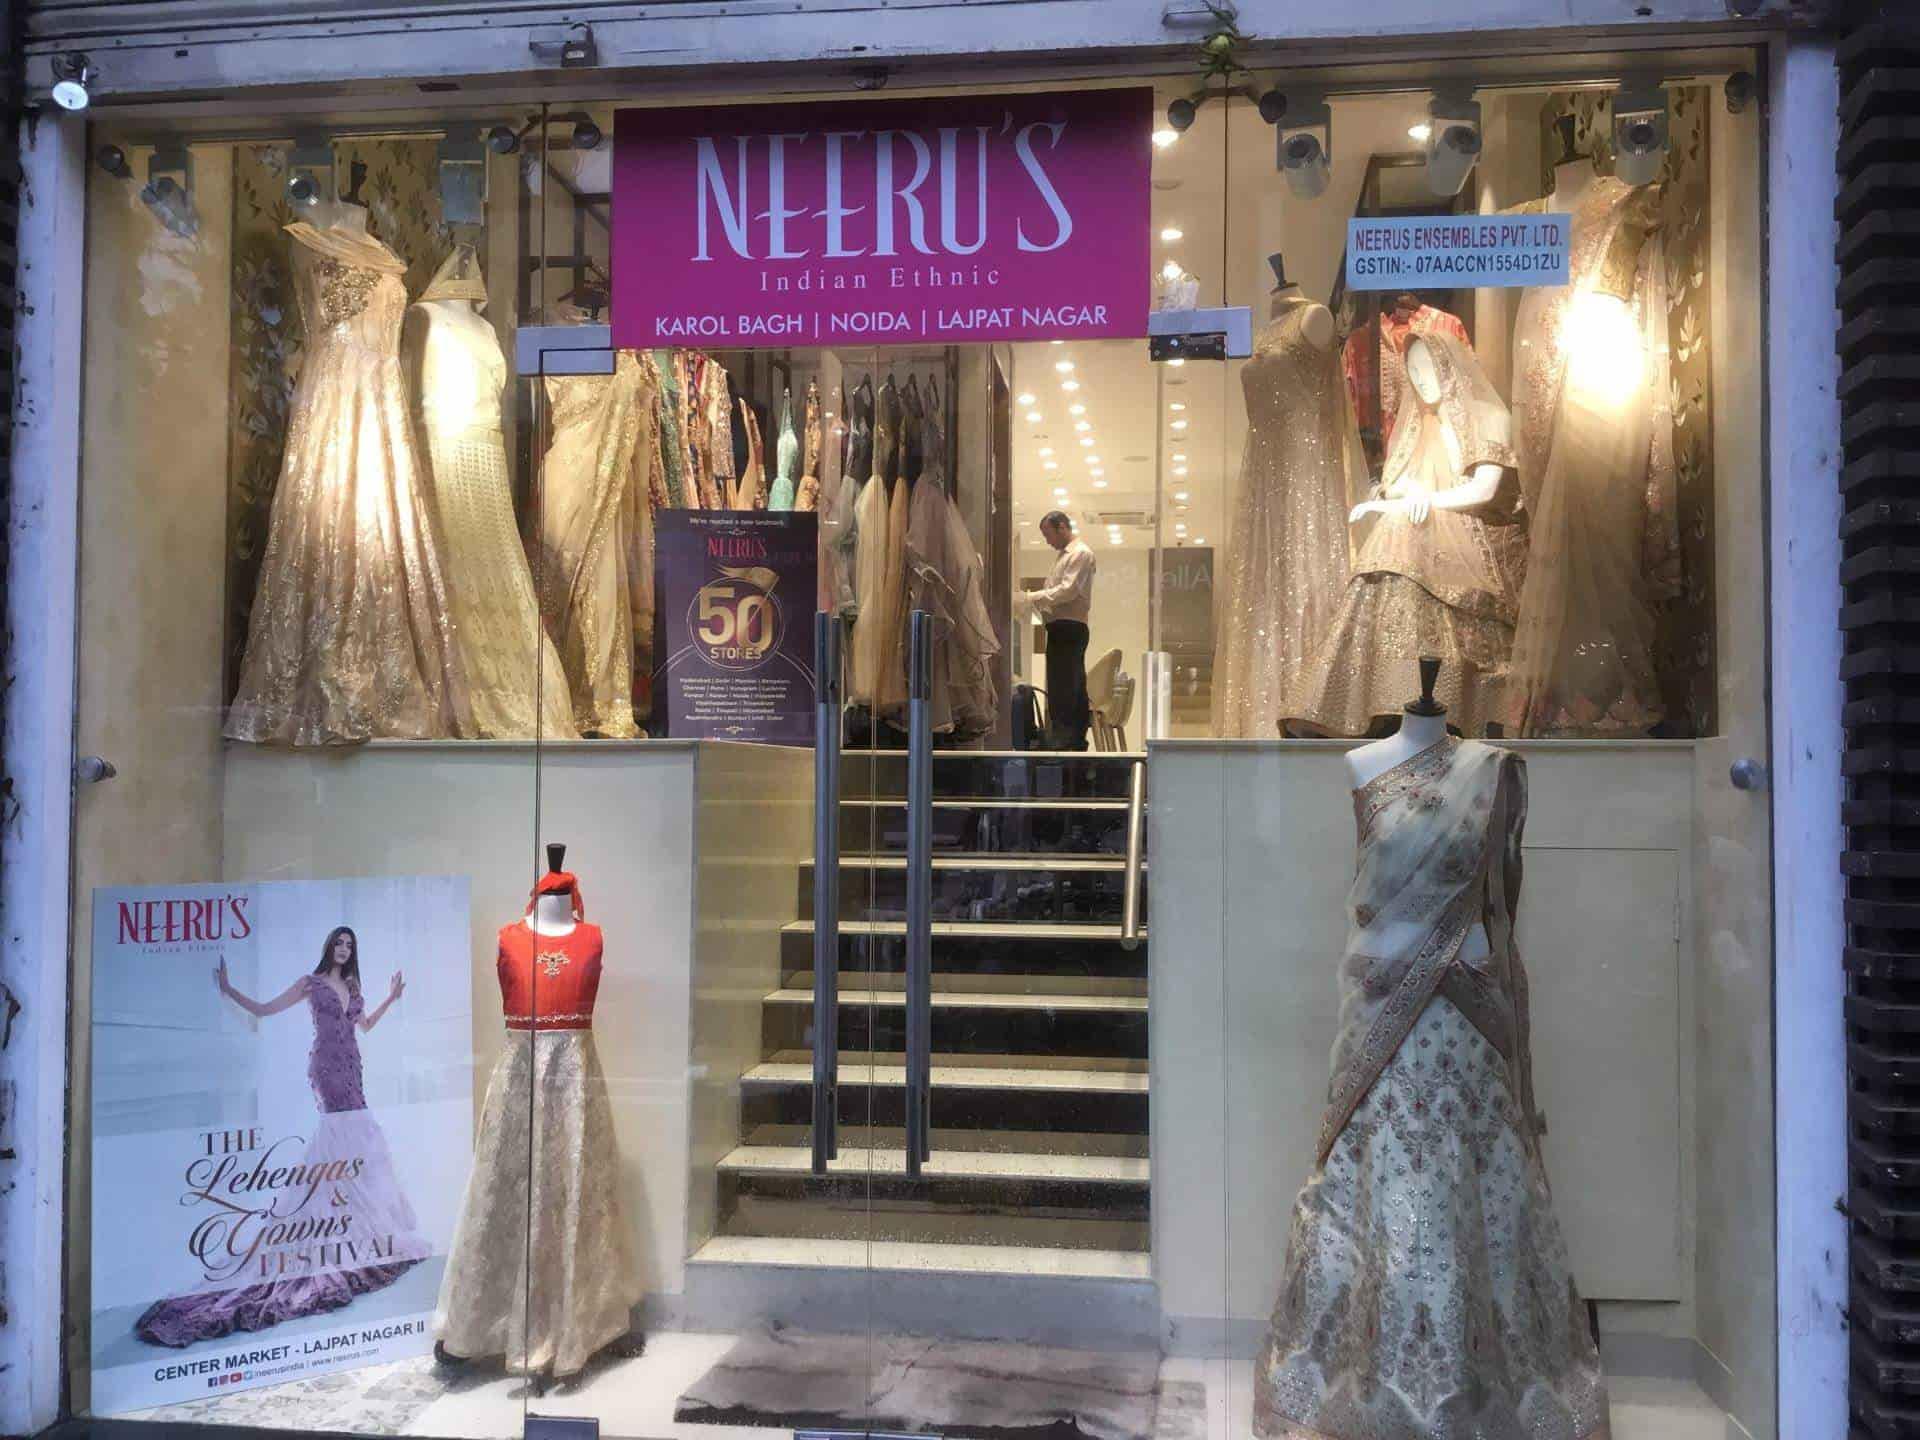 Neeru's Indian ethnic, Lajpat Nagar 2 - Boutiques in Delhi